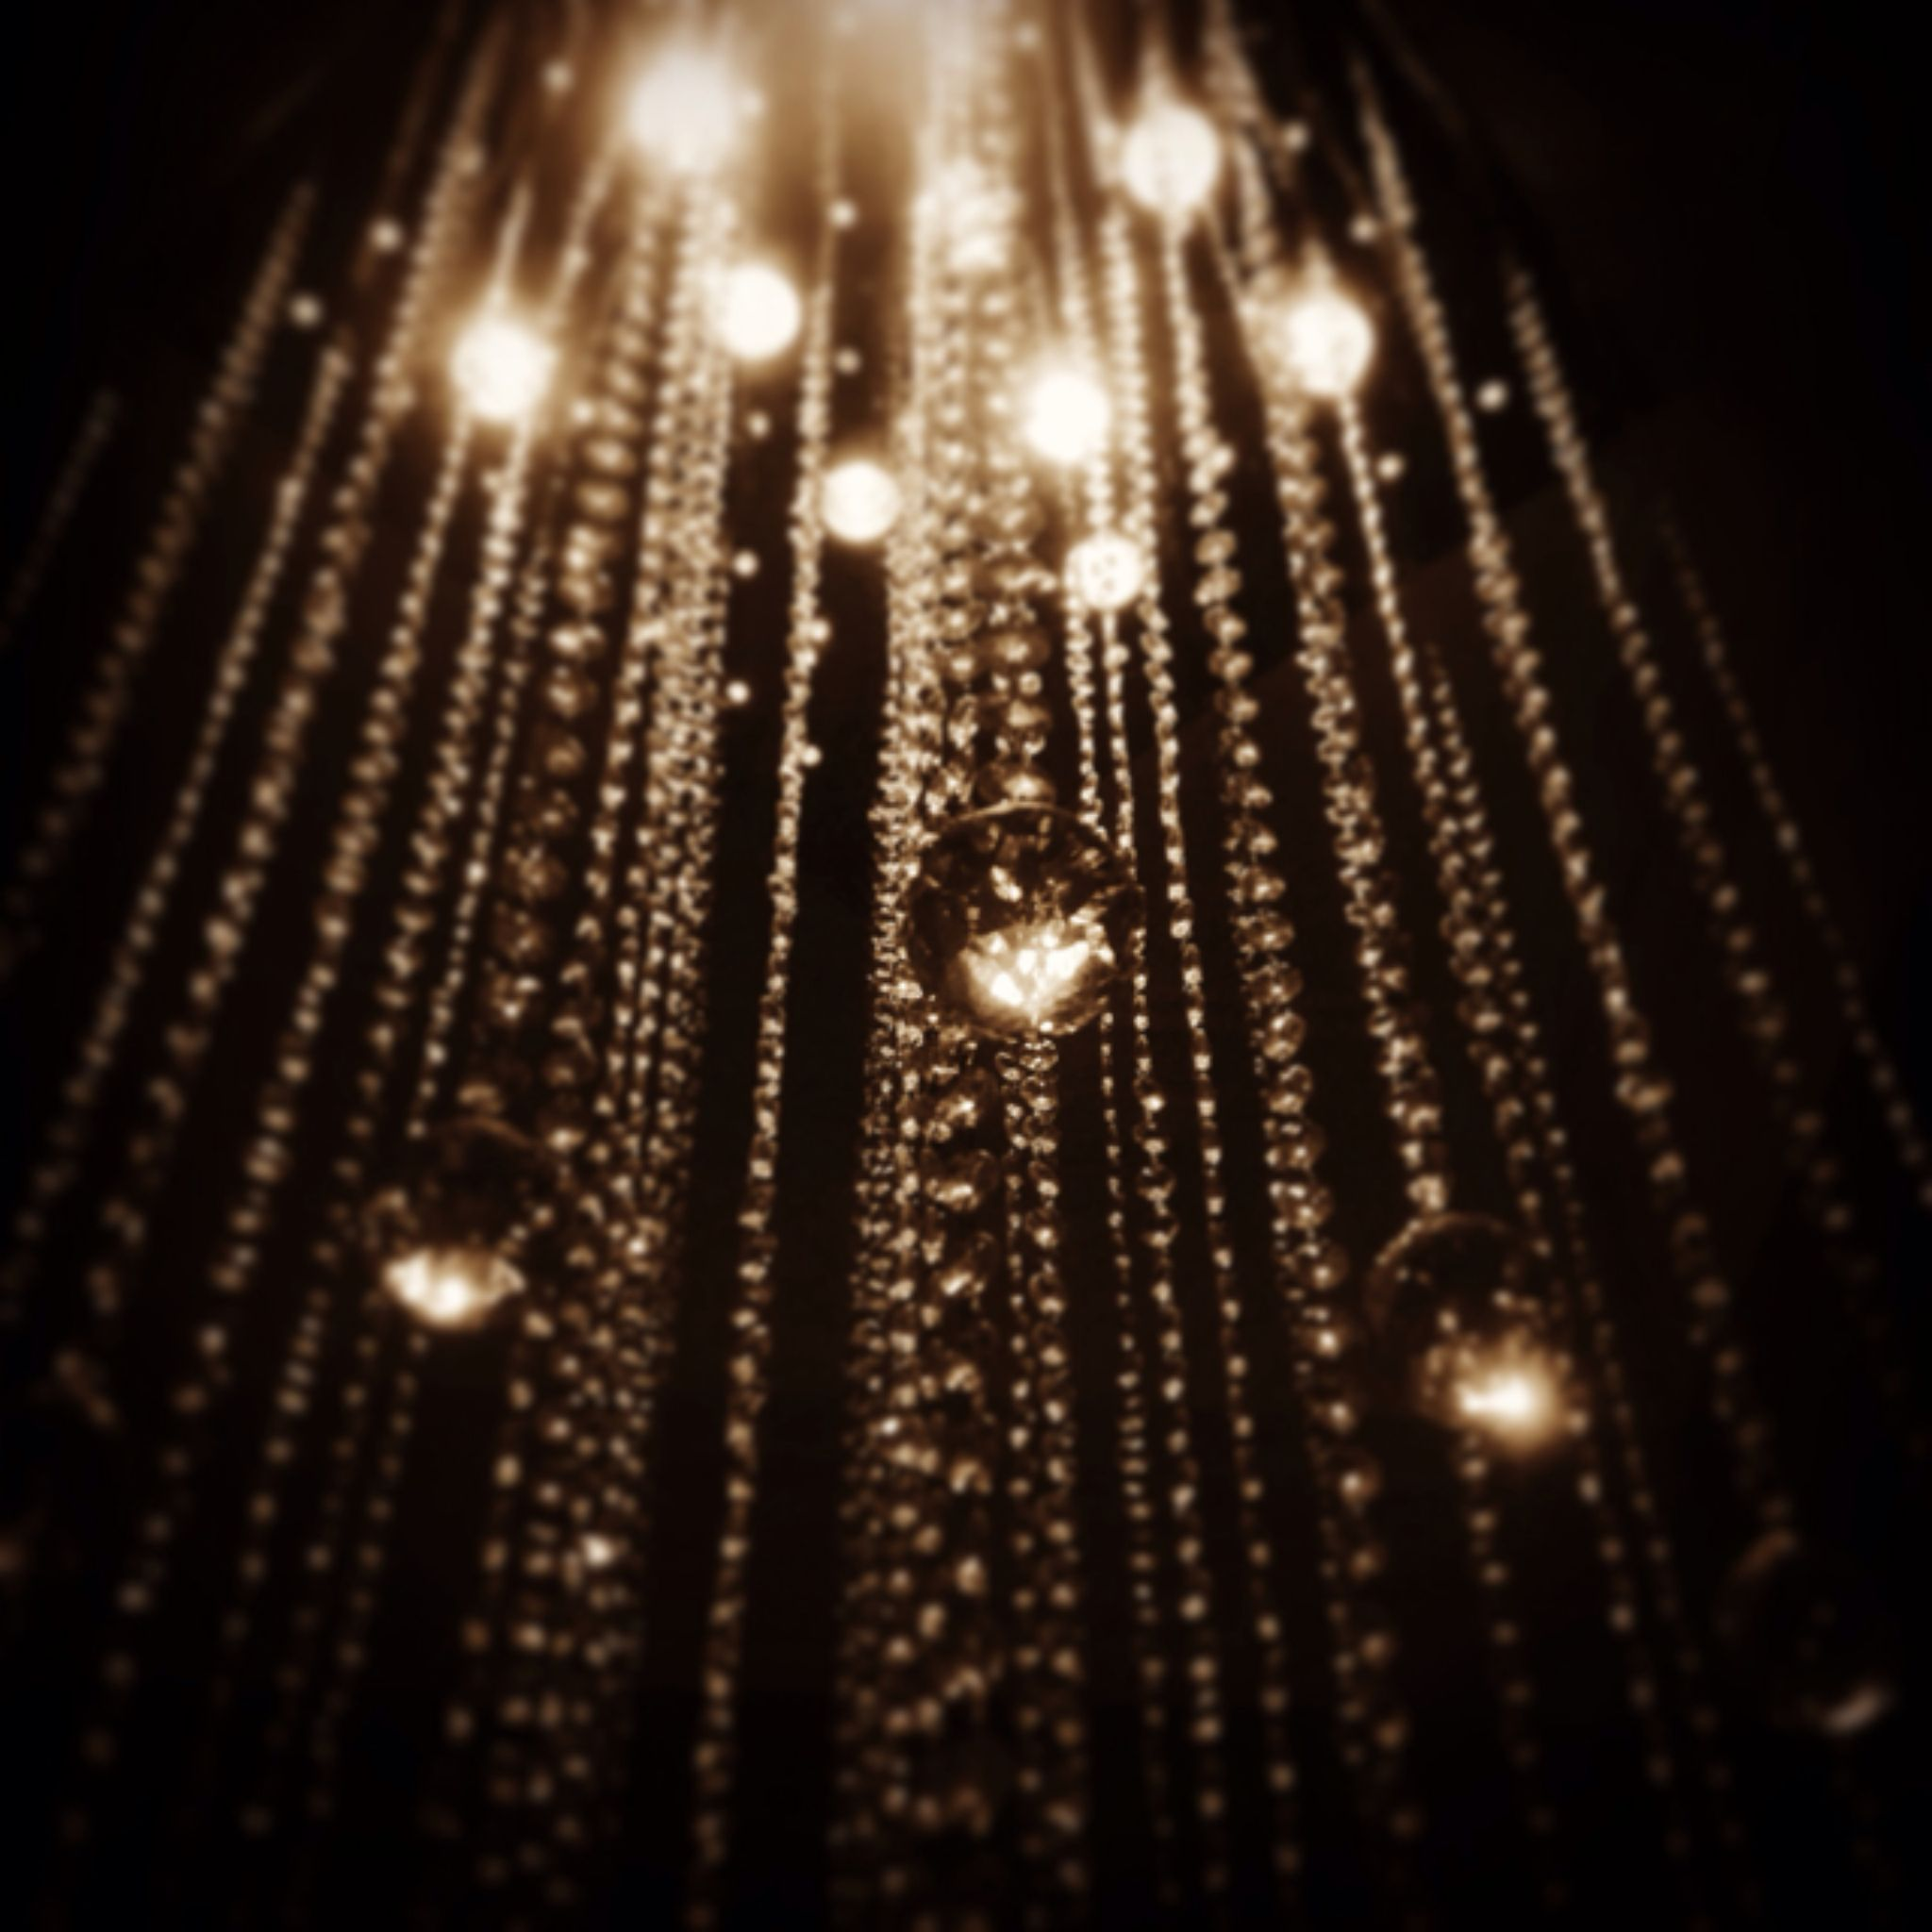 Light Rains (Mobile Shoot) by sahoora83